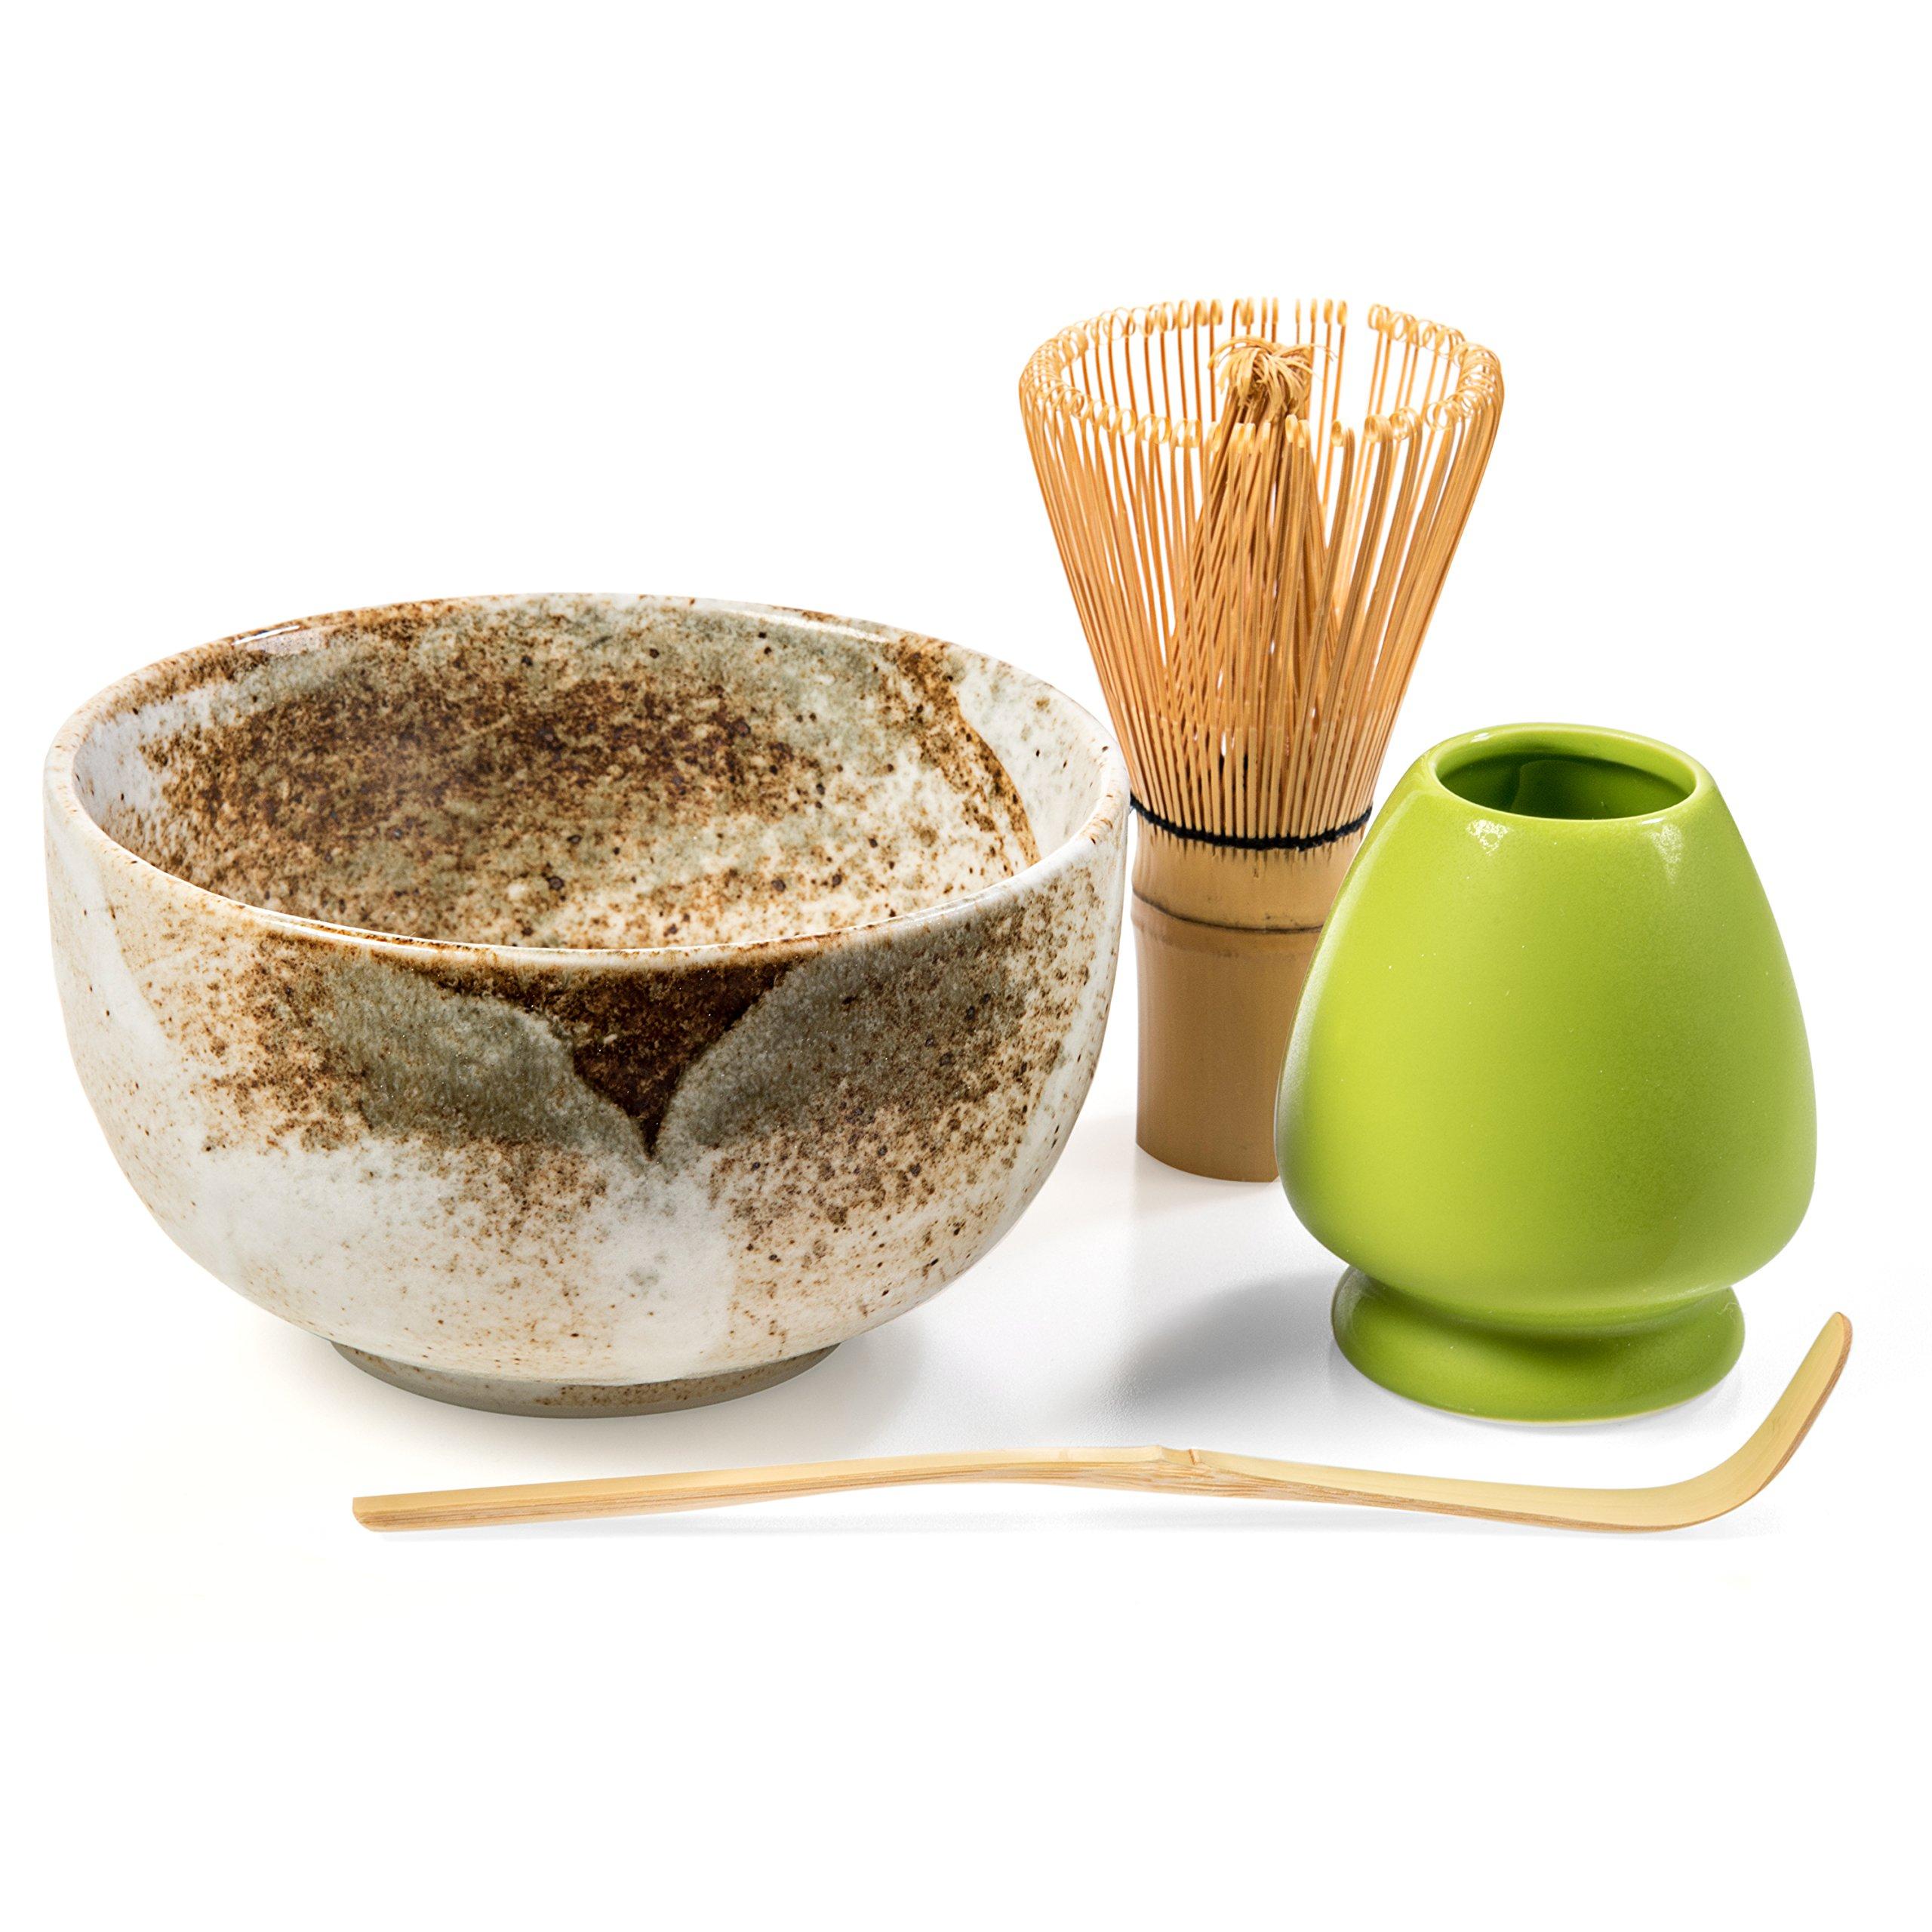 Tealyra - Matcha - Start Up Kit - 4 Items - Matcha Green Tea Gift Set - Japanese Made Beige Bowl - Bamboo Whisk and Scoop - Whisk Holder - Gift Box